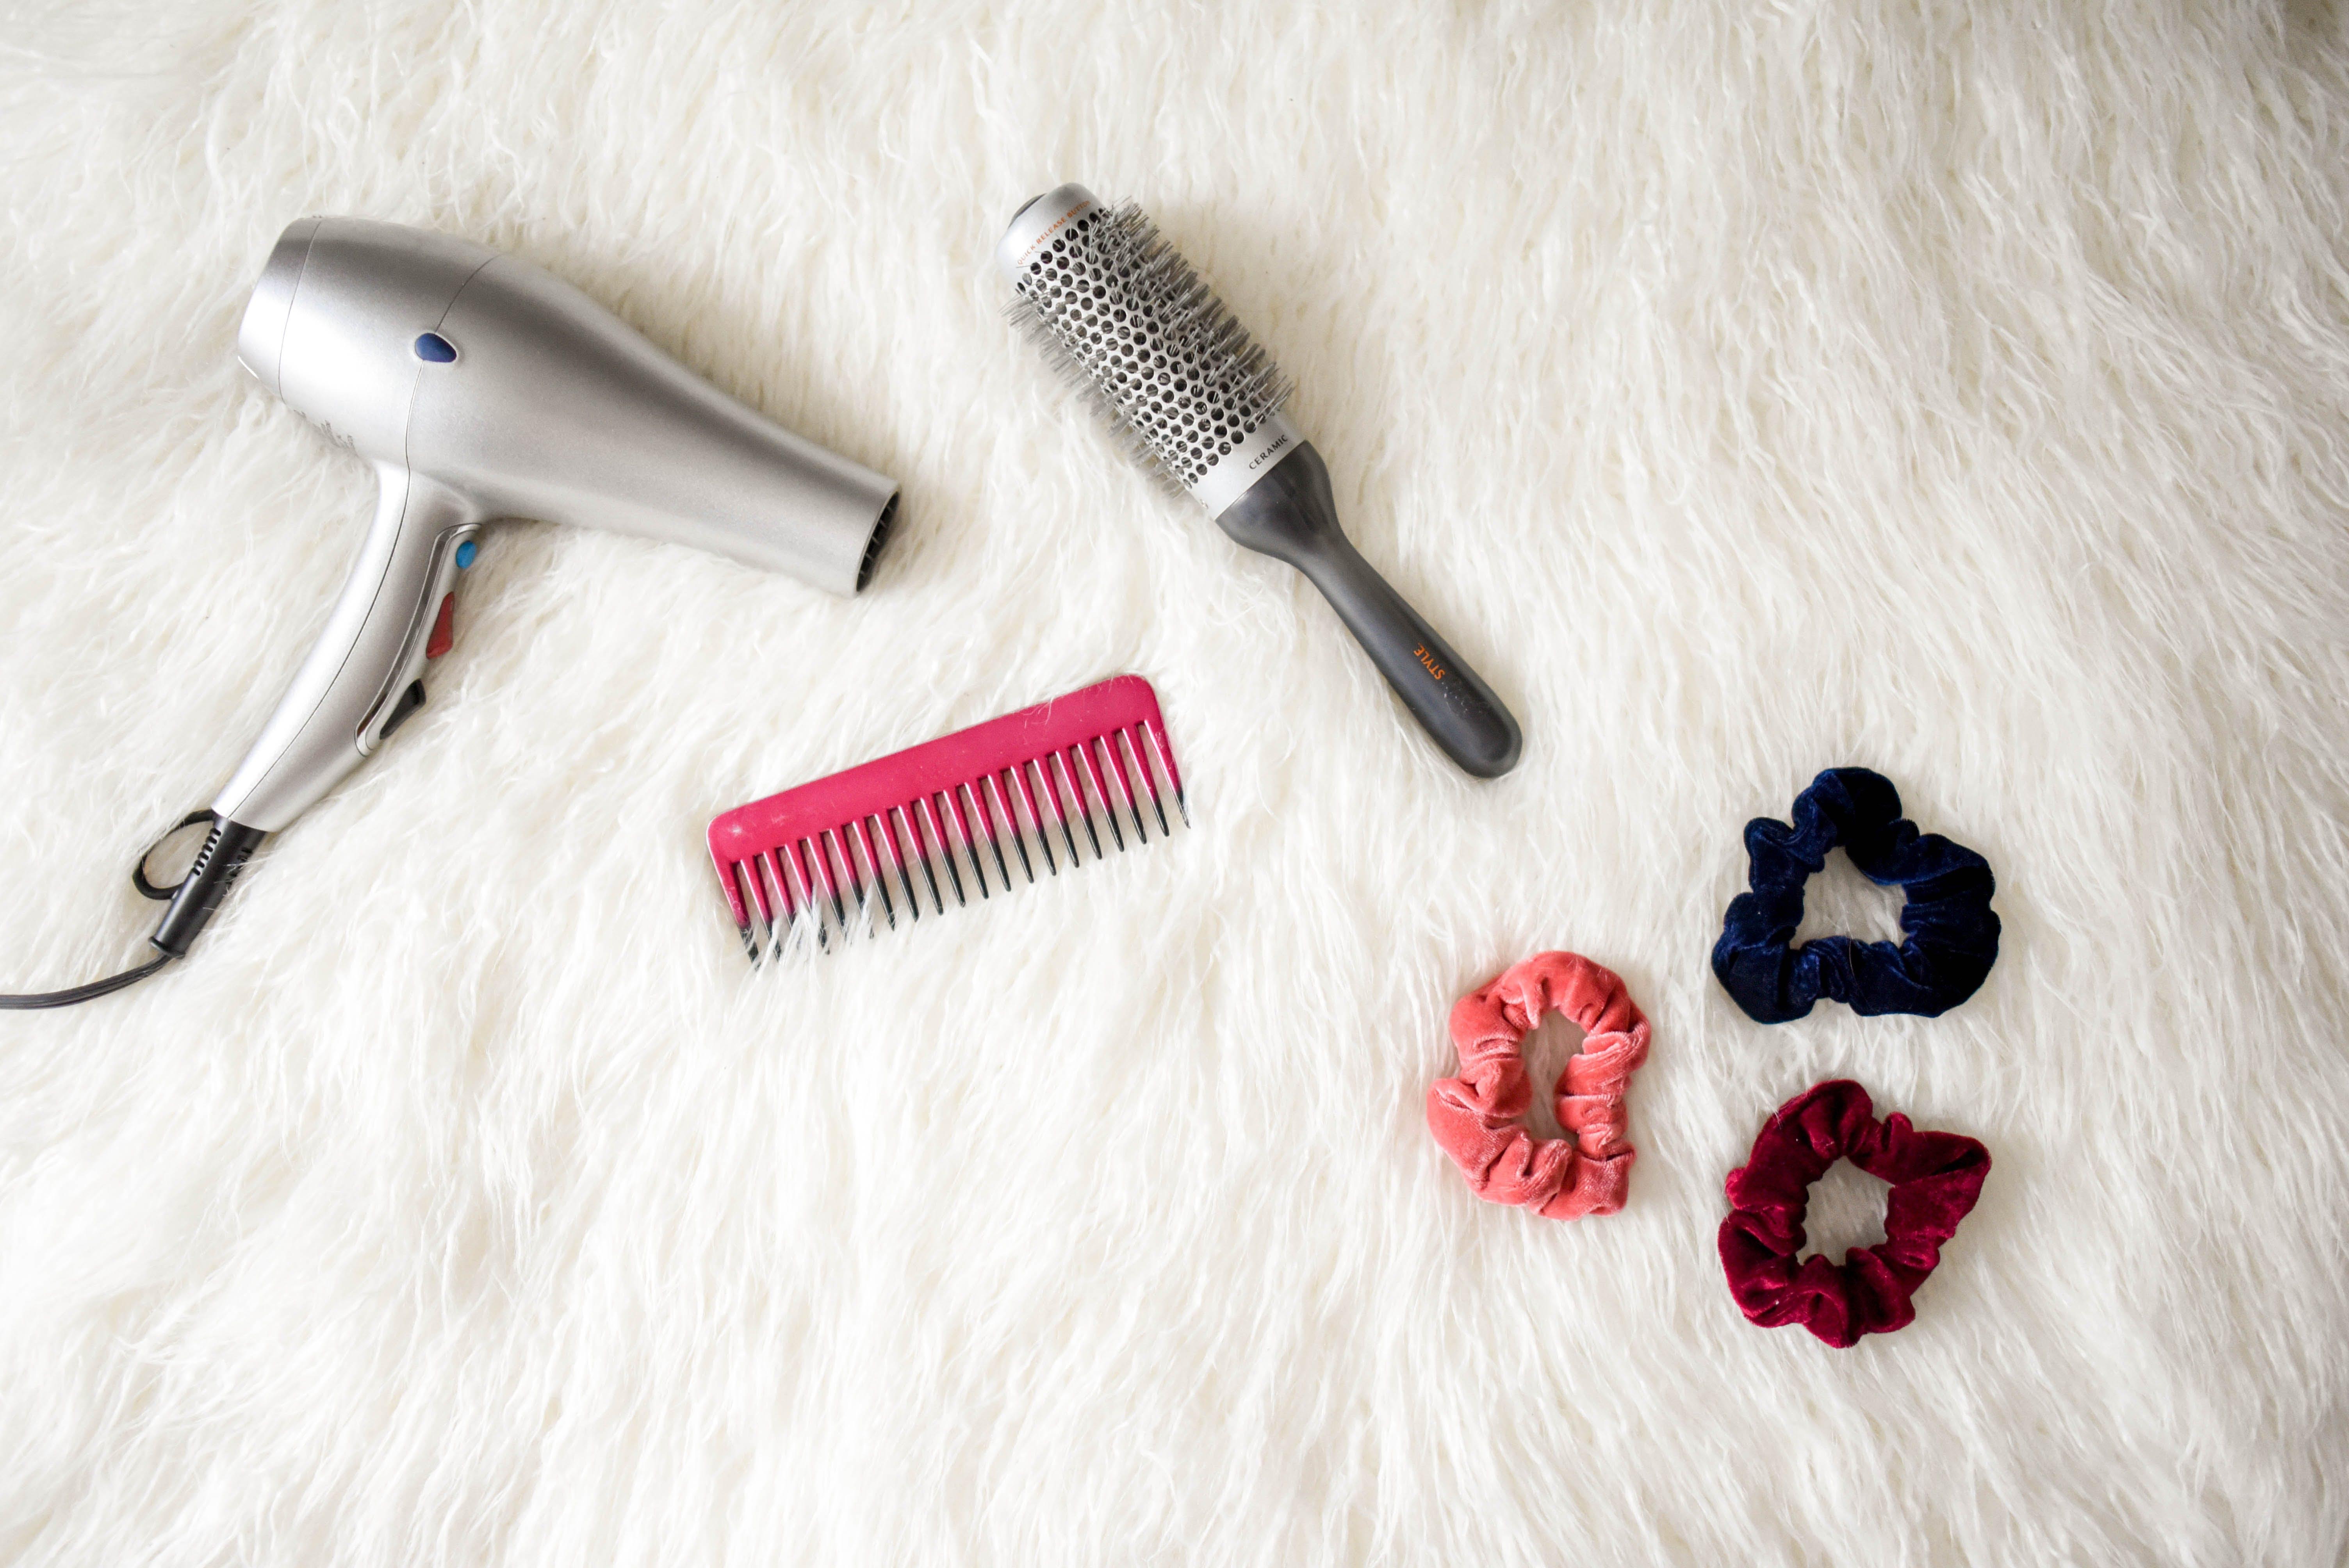 Grey Hair Blower Near Pink Hair Combs and Scrunchies